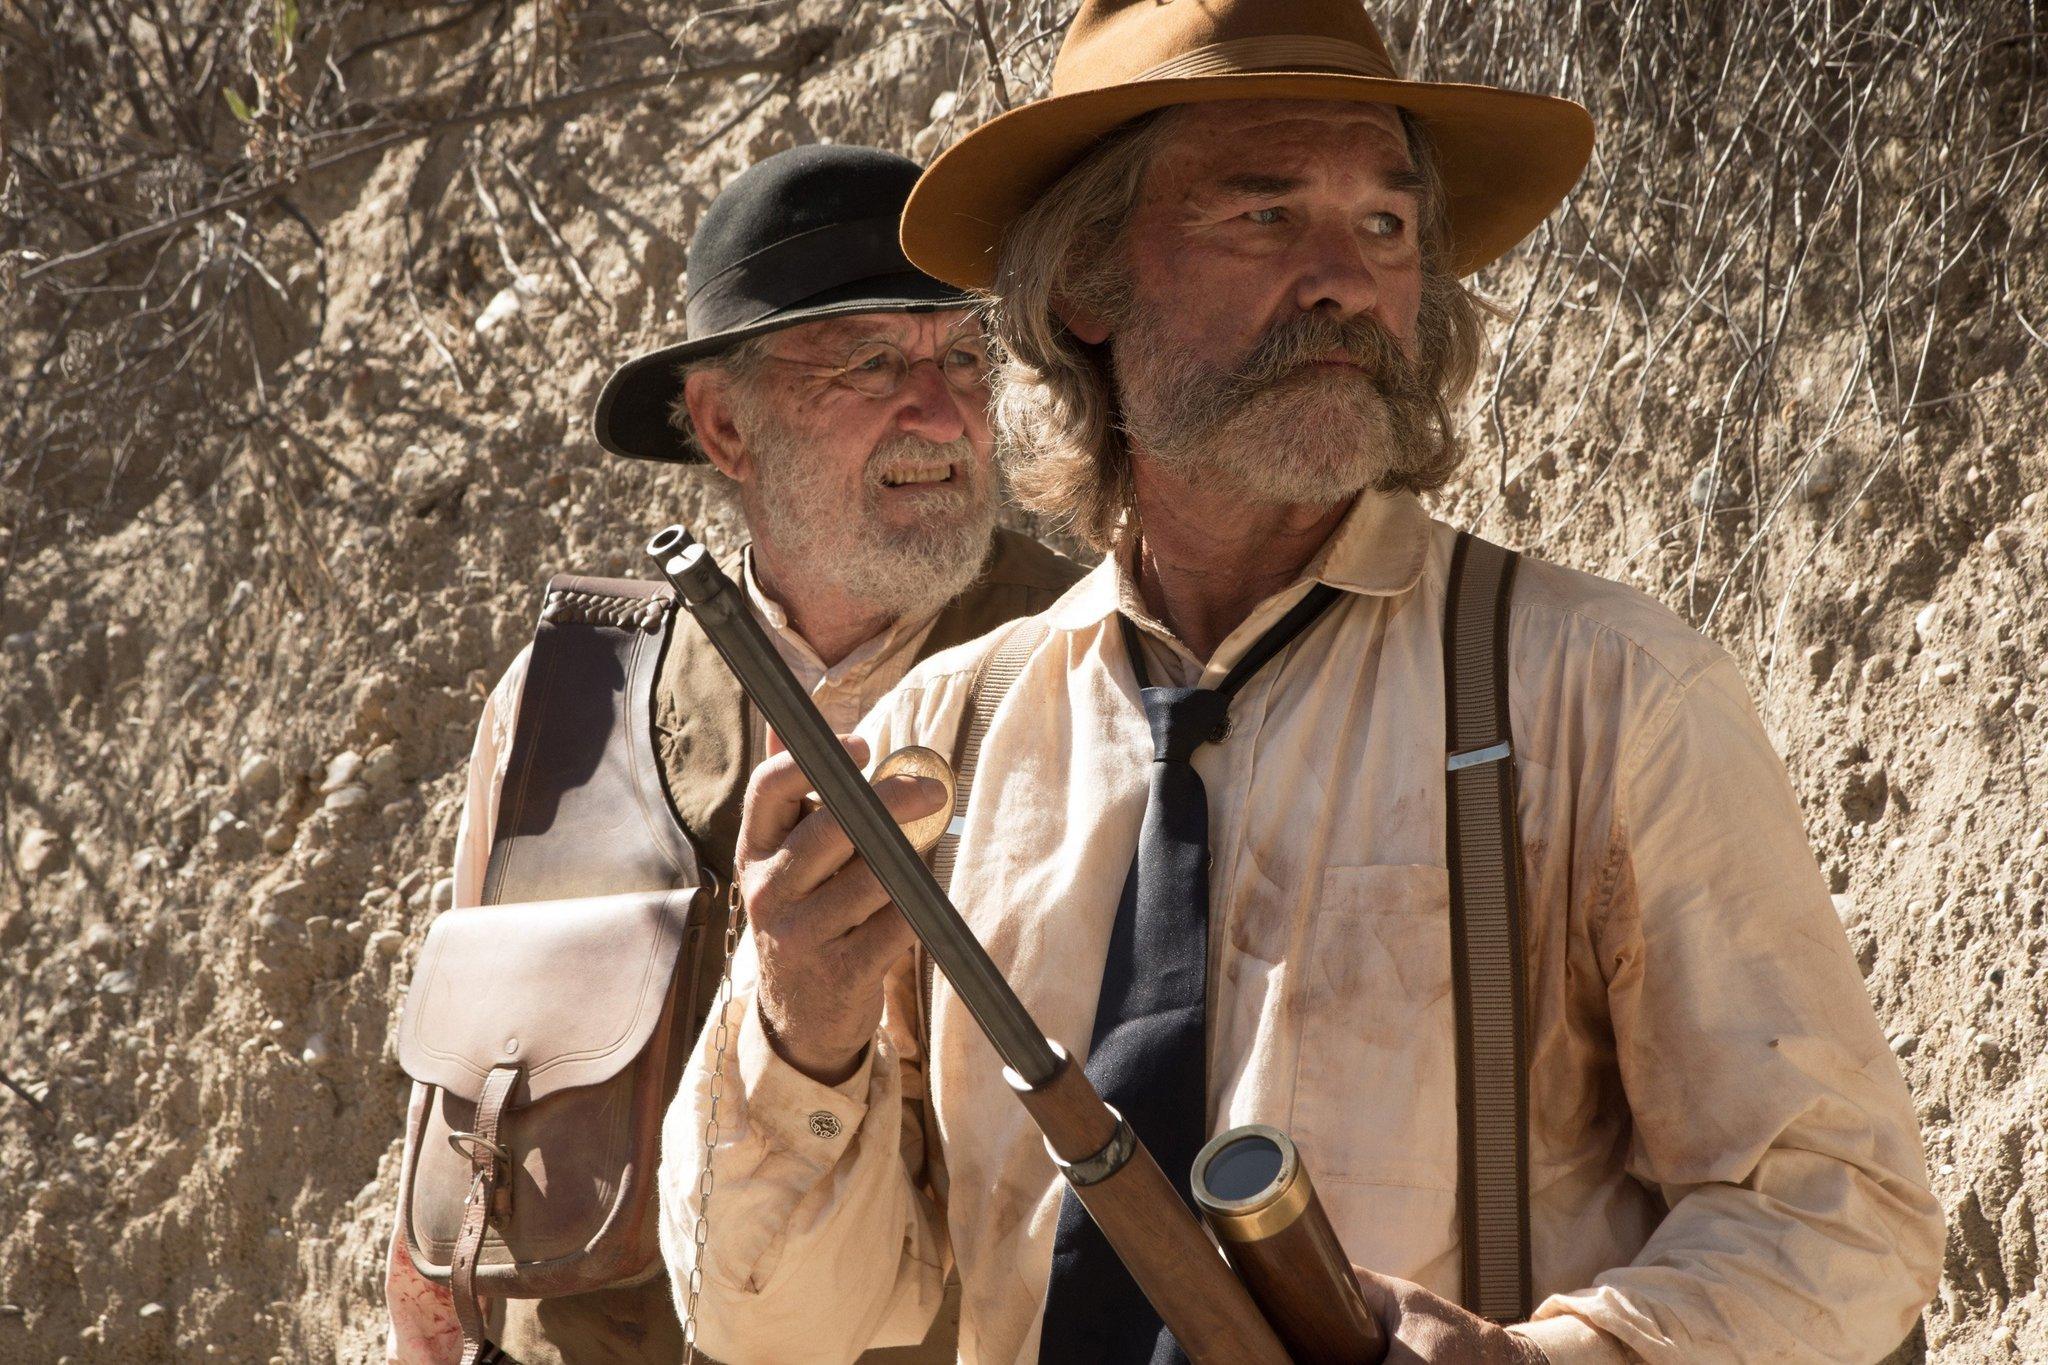 Westernfilme